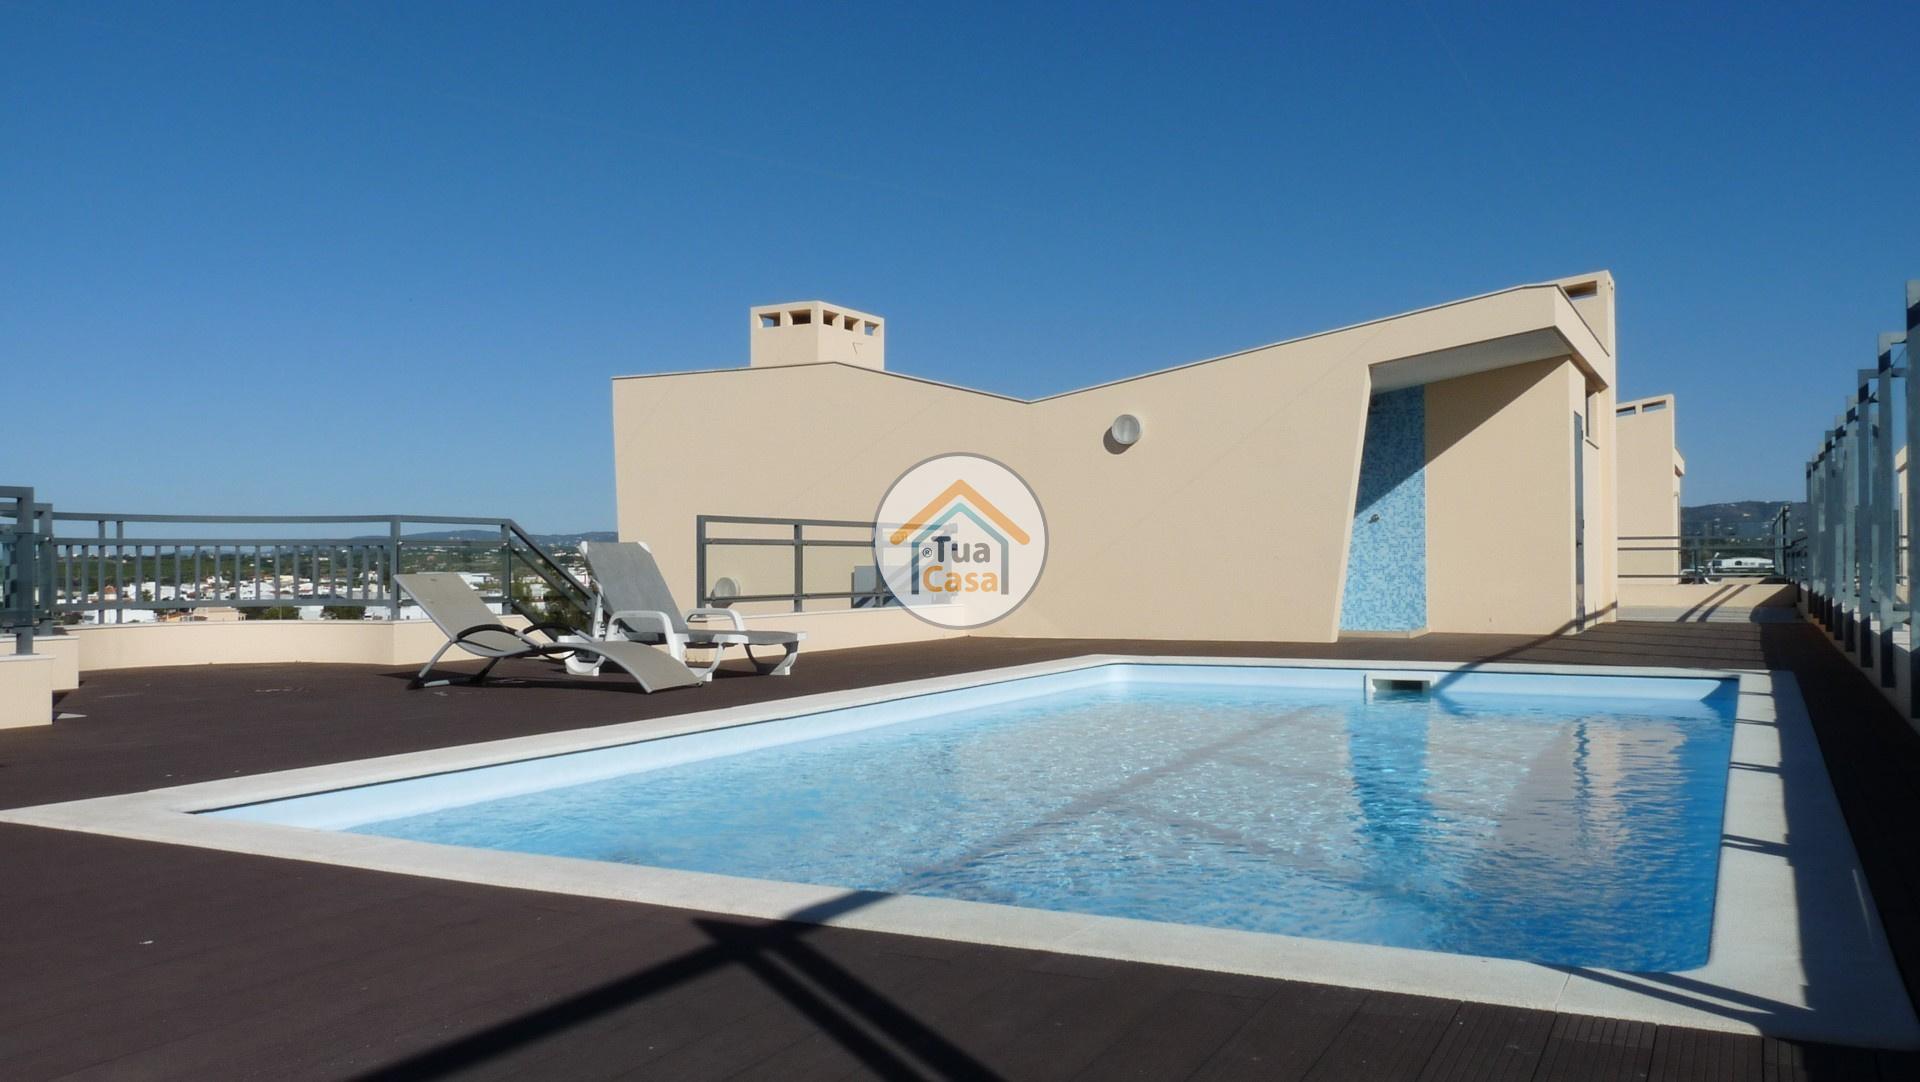 apartamento-luxo-marina-village-olhao-vista-mar-tuacasa-piscina-terraco-privado (2)